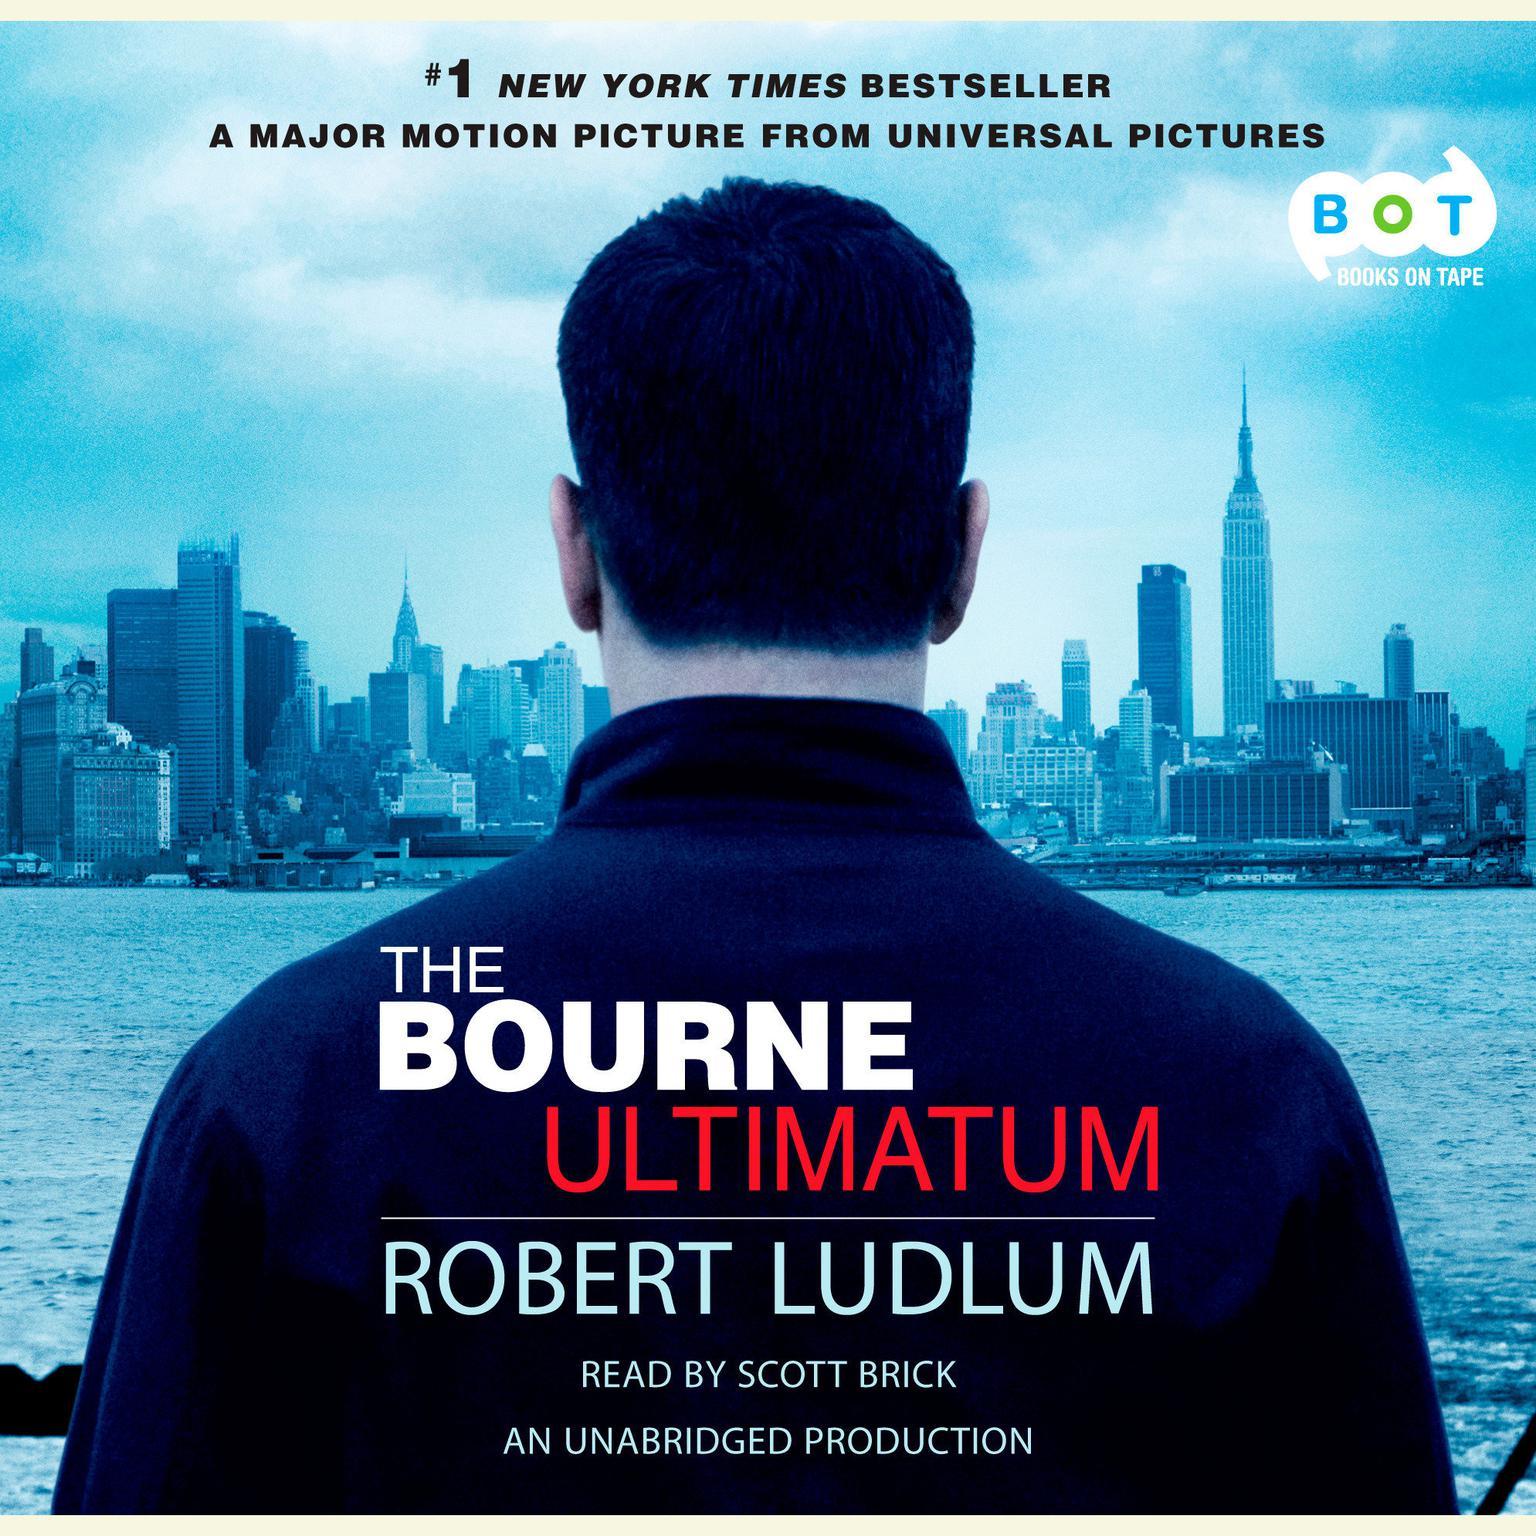 The Bourne Ultimatum (Jason Bourne Book #3): A Novel Audiobook, by Robert Ludlum